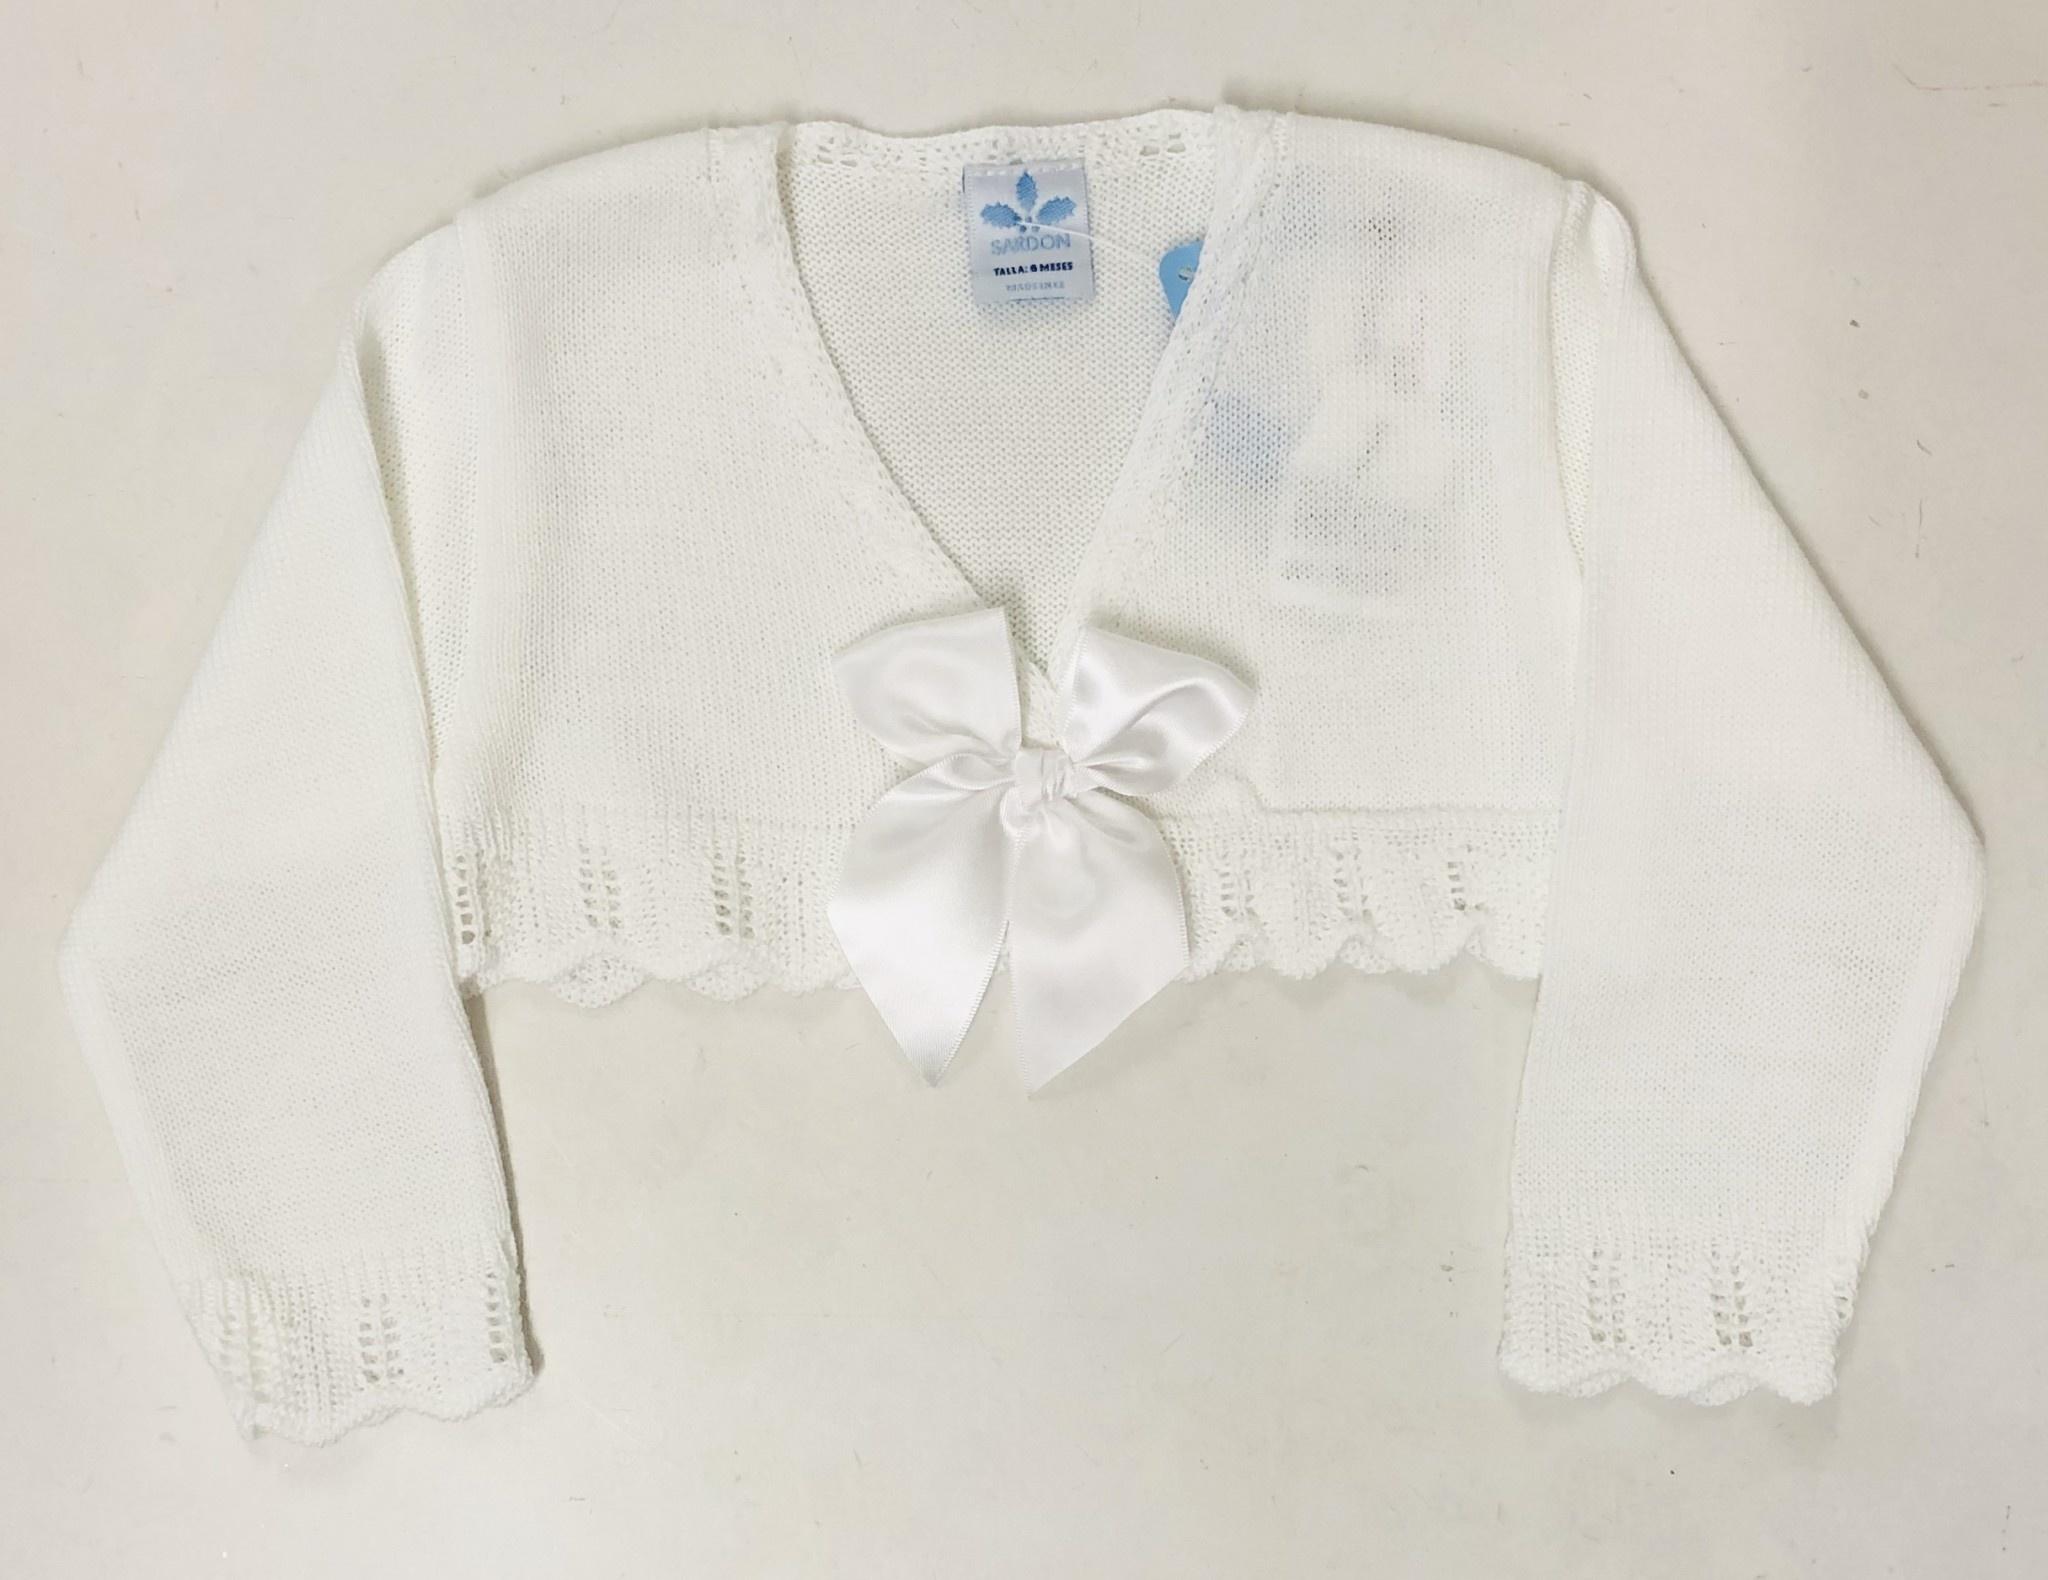 Sardon Sardon 19VE-180 White Cardigan With Bow 18MONTHS